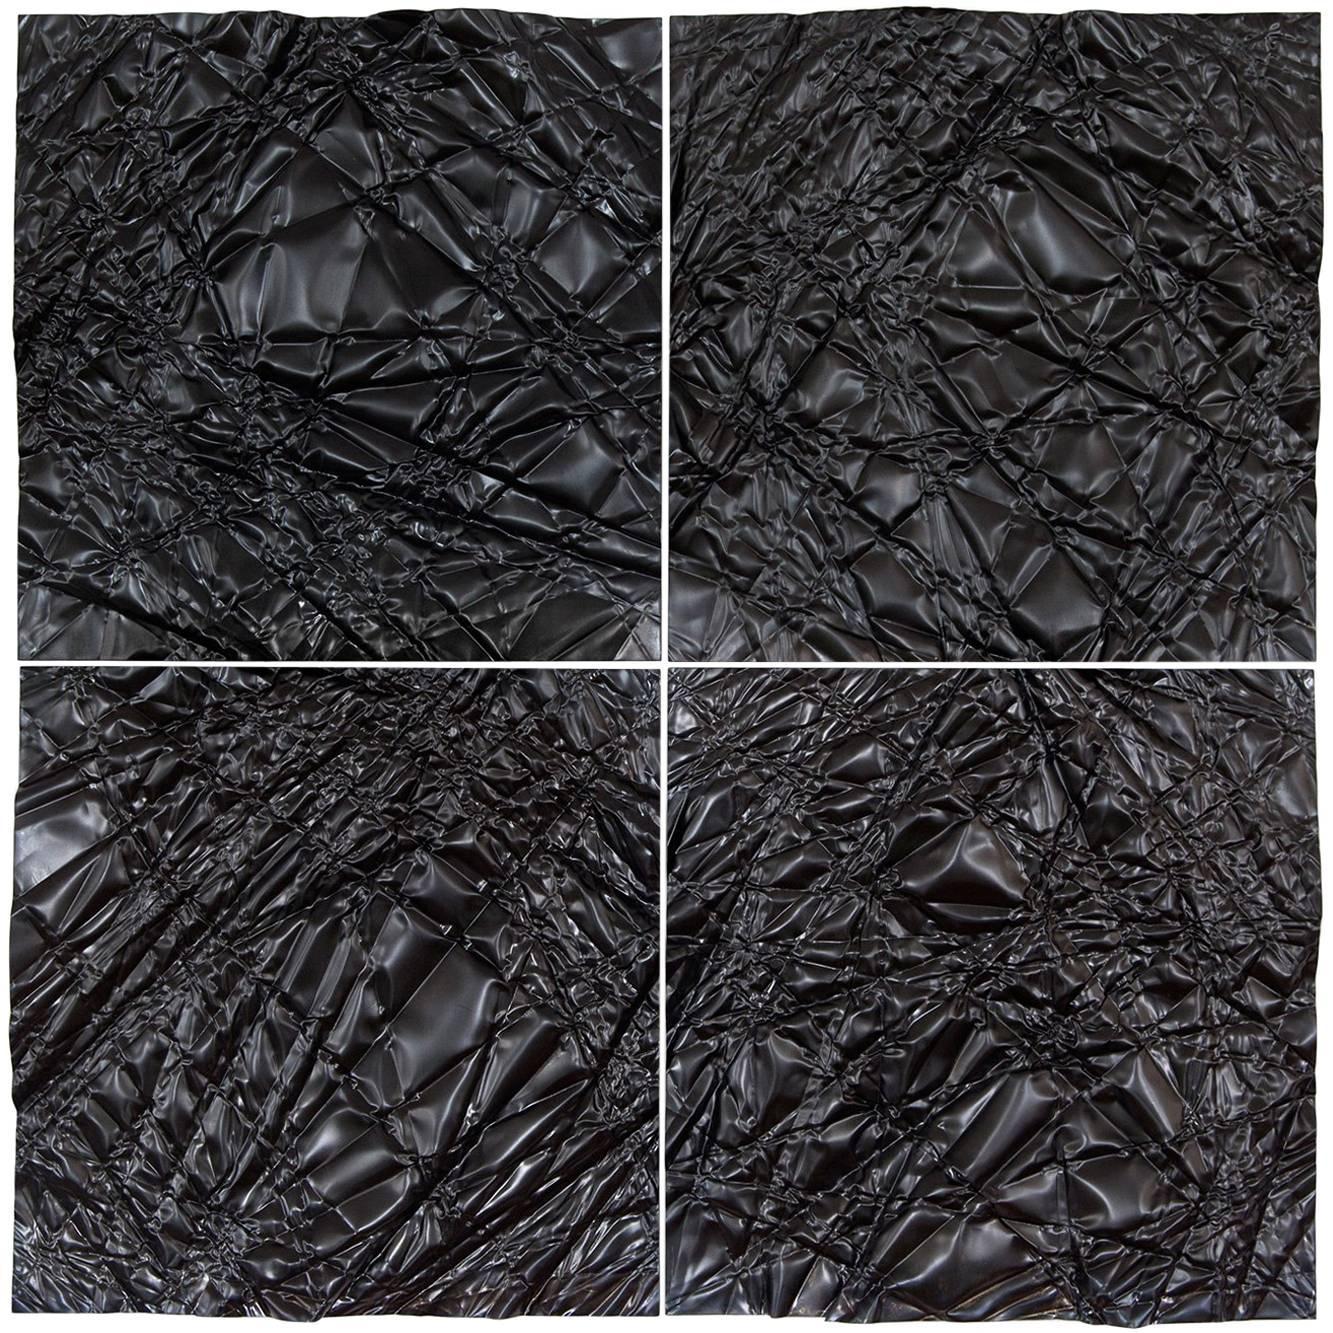 Christopher Prinz Wrinkled Tiles